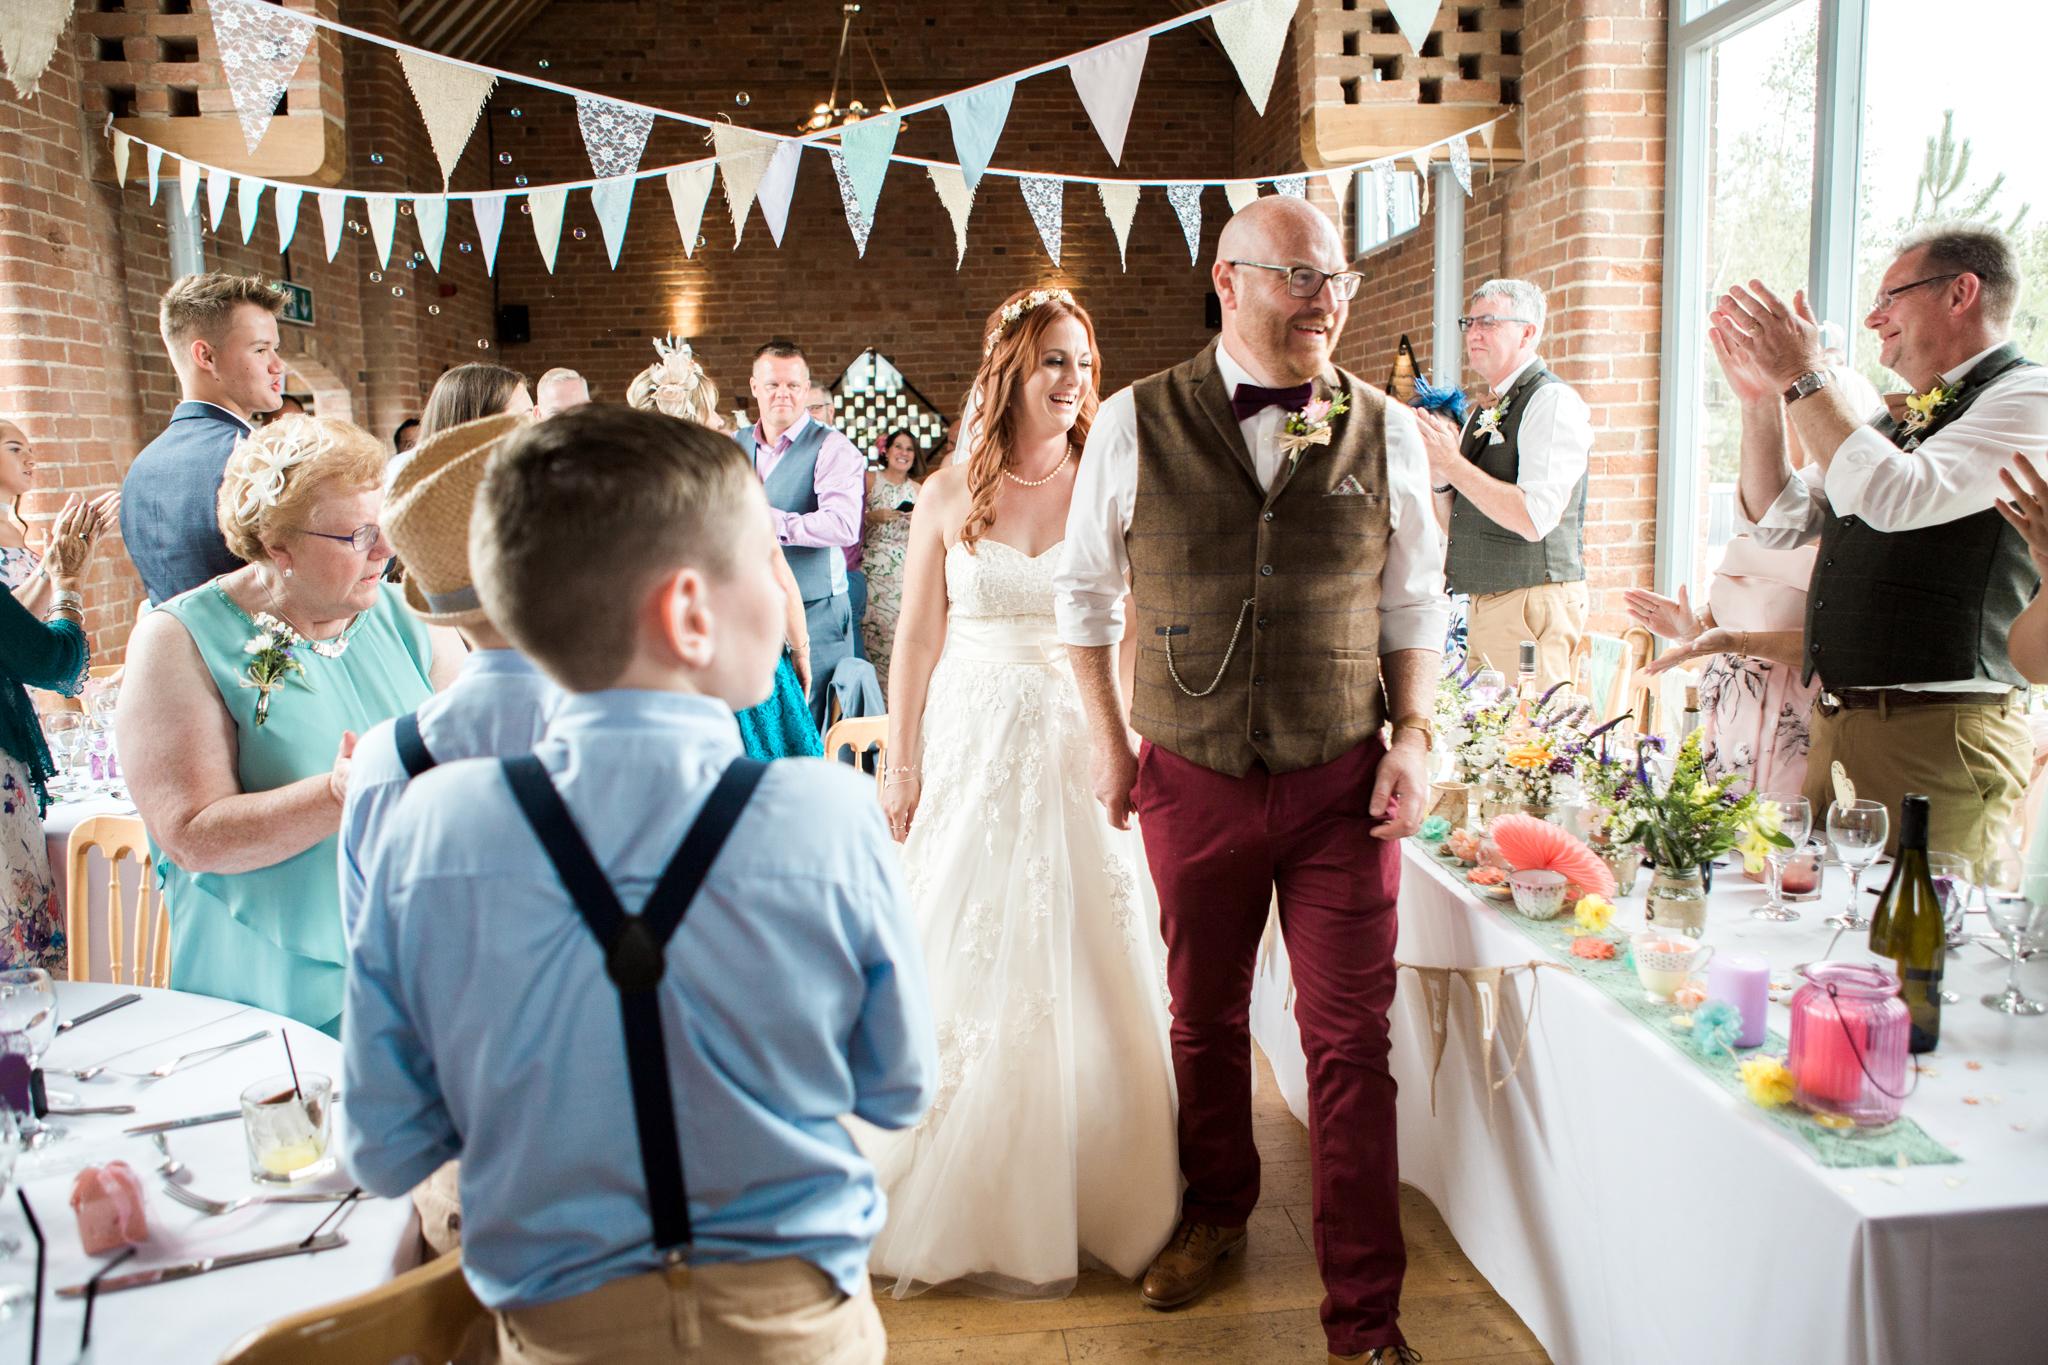 Rowsie & Lee, Swallows Nest Barn Wedding, Cotswold wedding photographer, Warwickshire Wedding Photographer-126.jpg